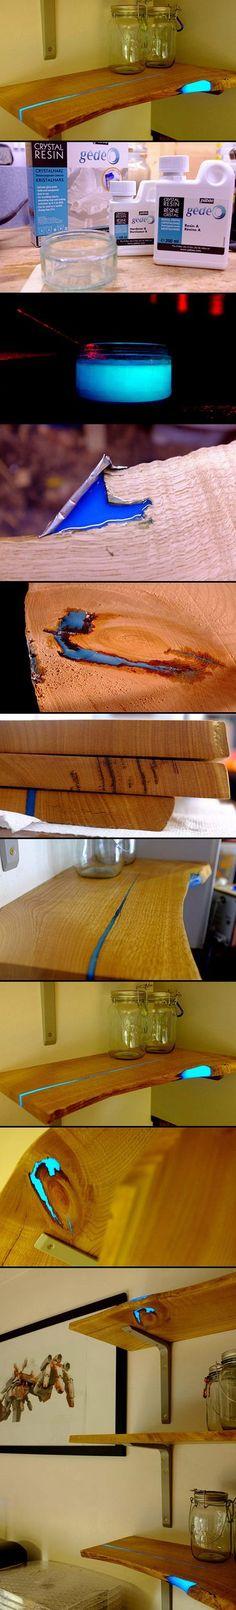 15 Little Clever ideas to improve your kitchen | Diy & Crafts Ideas Magazine